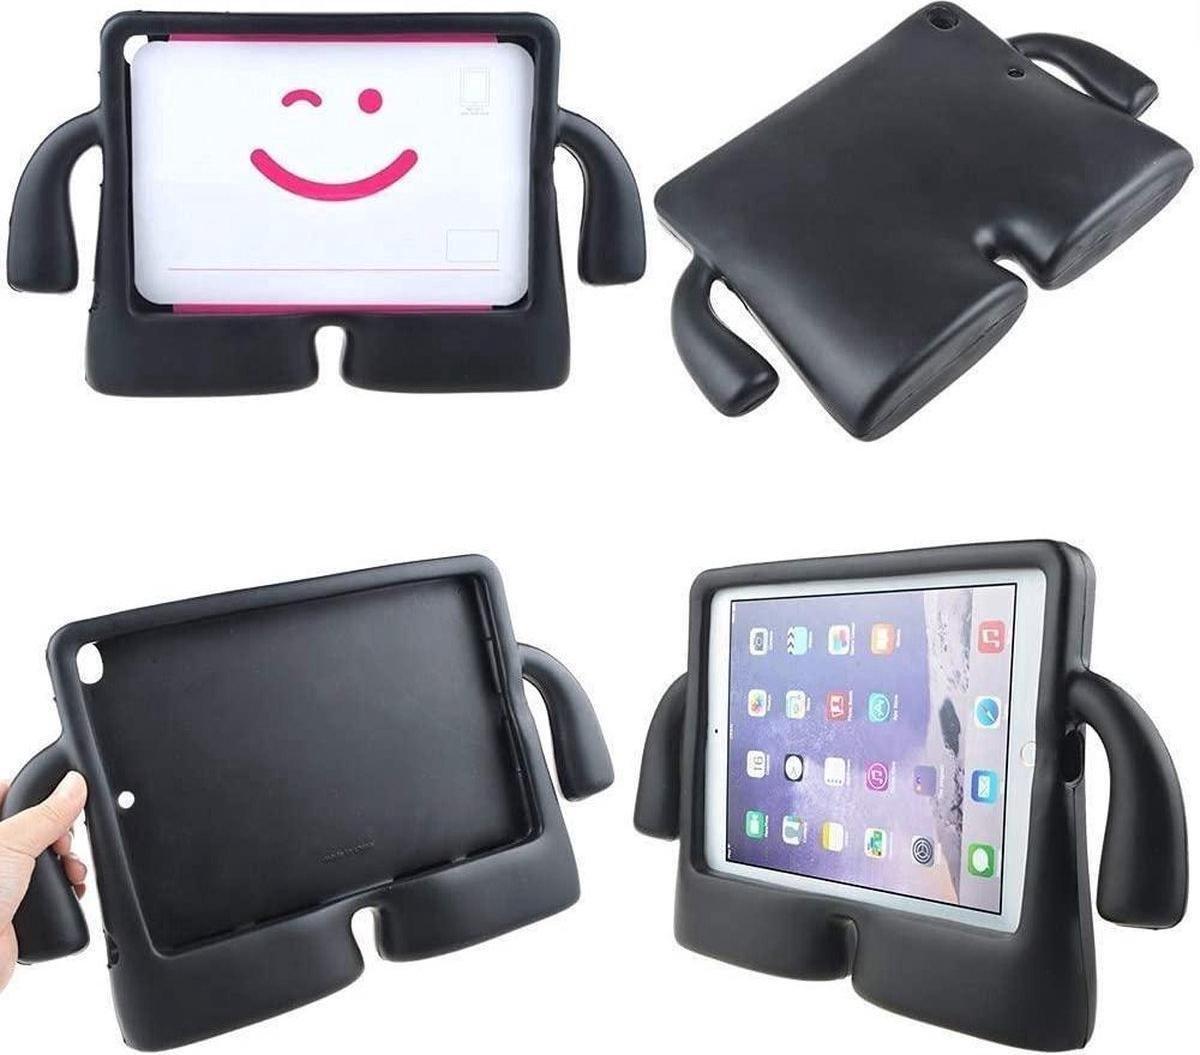 SMT Apple iPad Pro 11 Kinder Tablethoes - Cover - Shockproof - Kidsproof - Handvat - Stevige Foam - Draagbaar - iPad Pro 2018 - 2020 - Zwart